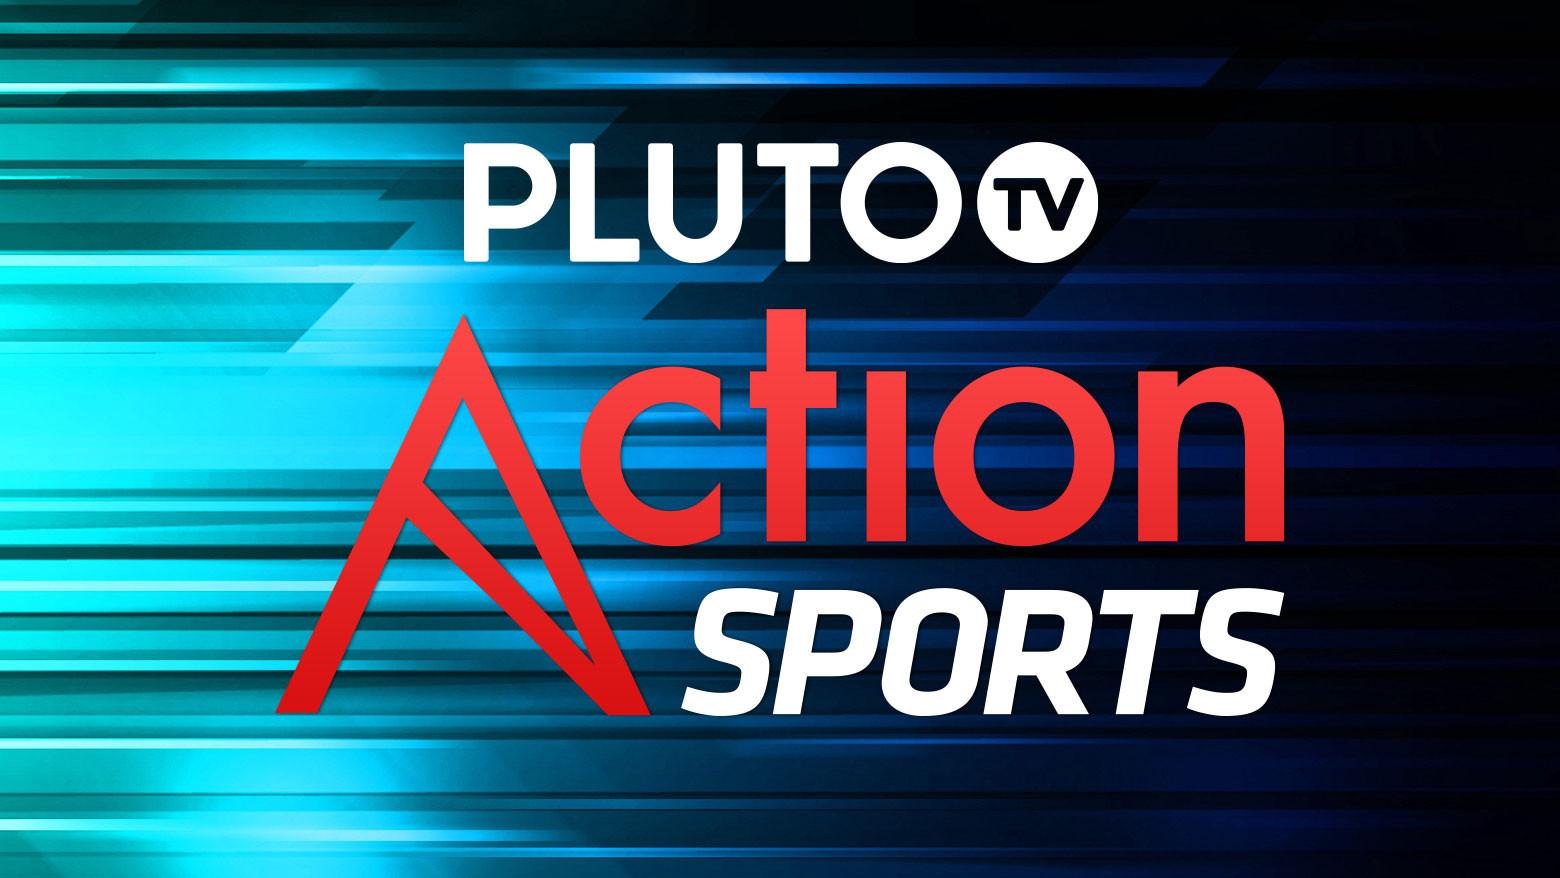 Pluto TV action sports featuredImage new